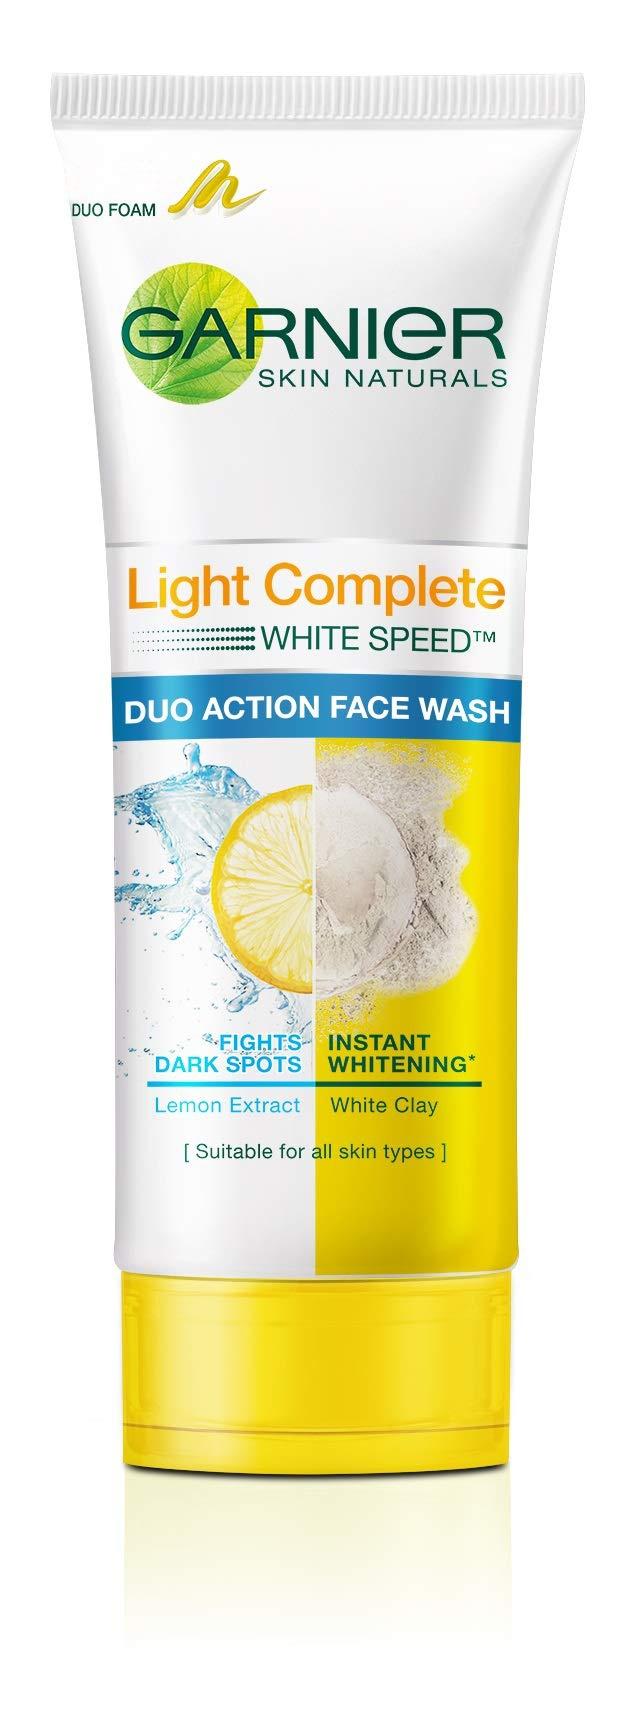 Garnier Light Complete Duo Action Facewash